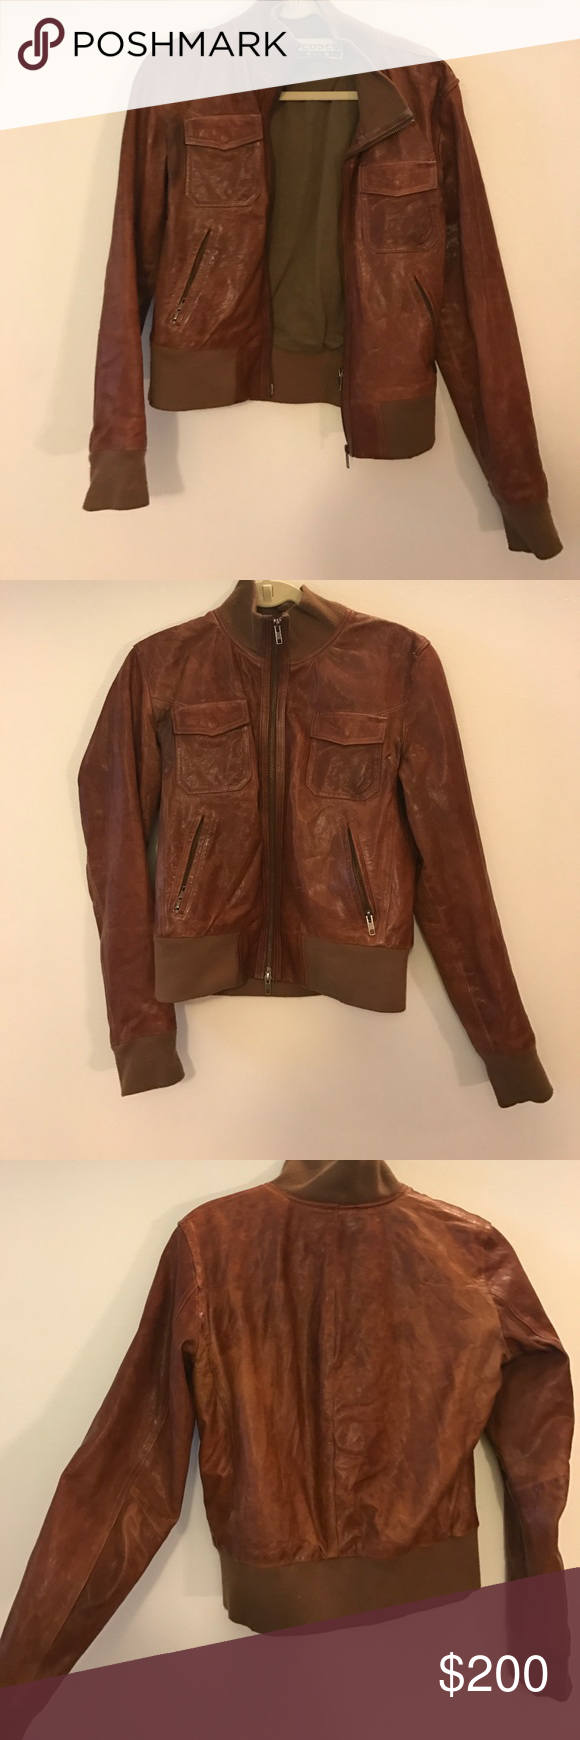 100 leather jacket! Brand closed. Size Medium! Gently